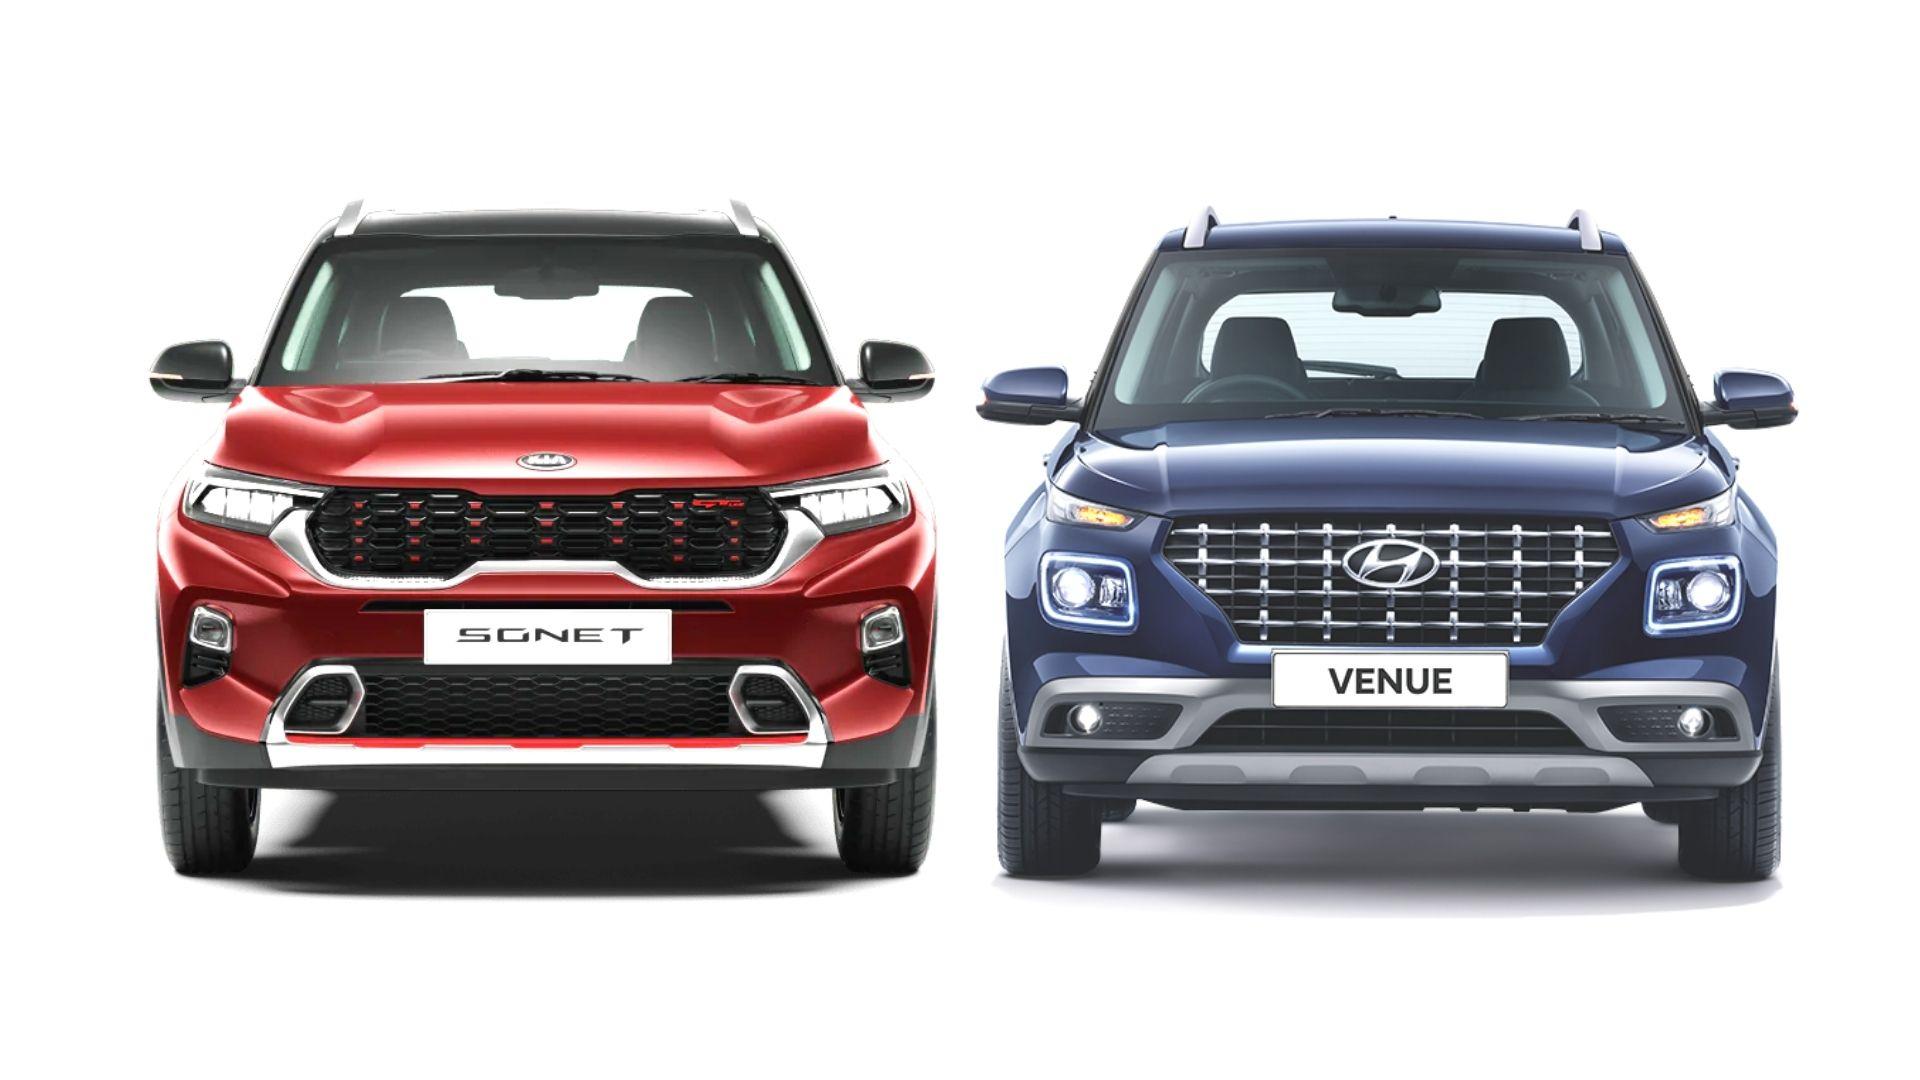 Hyundai Venue Vs Kia Sonet Spec Sheet And Features Comparison